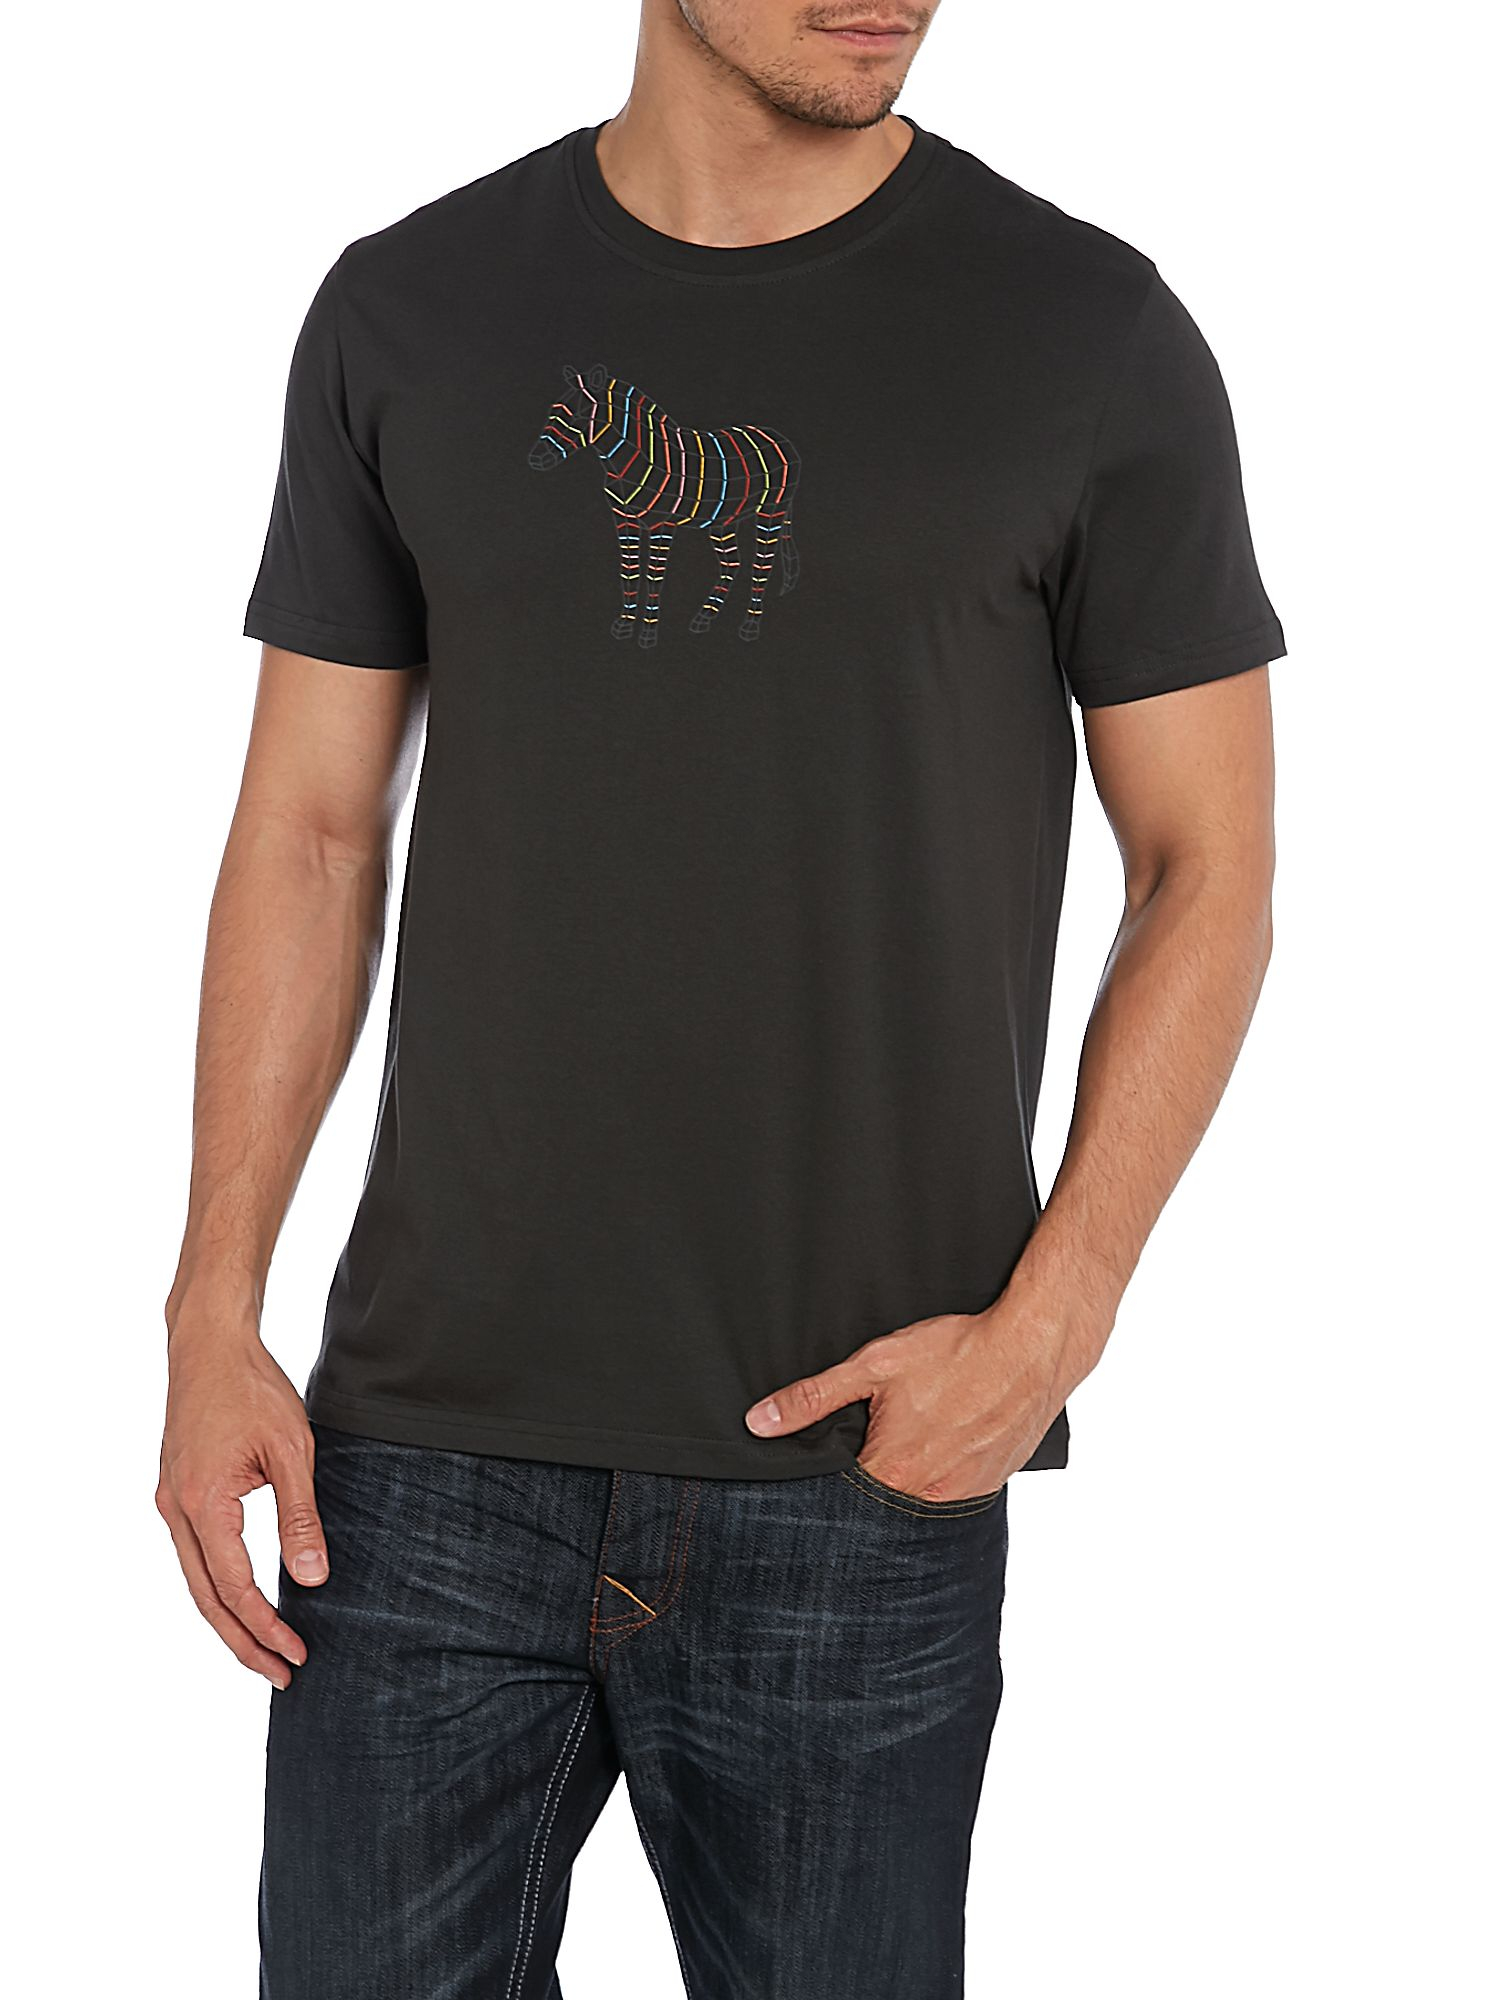 Paul smith paul smith zebra print t shirt in black for men for Vista print tee shirt